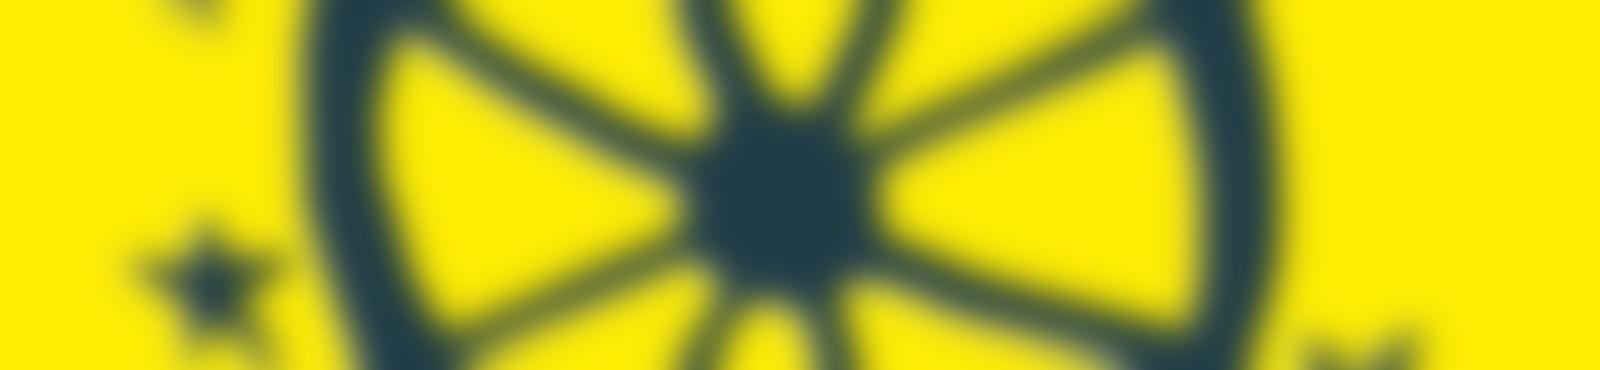 Blurred d8642816 5d70 45ee 805d 075c66be1626